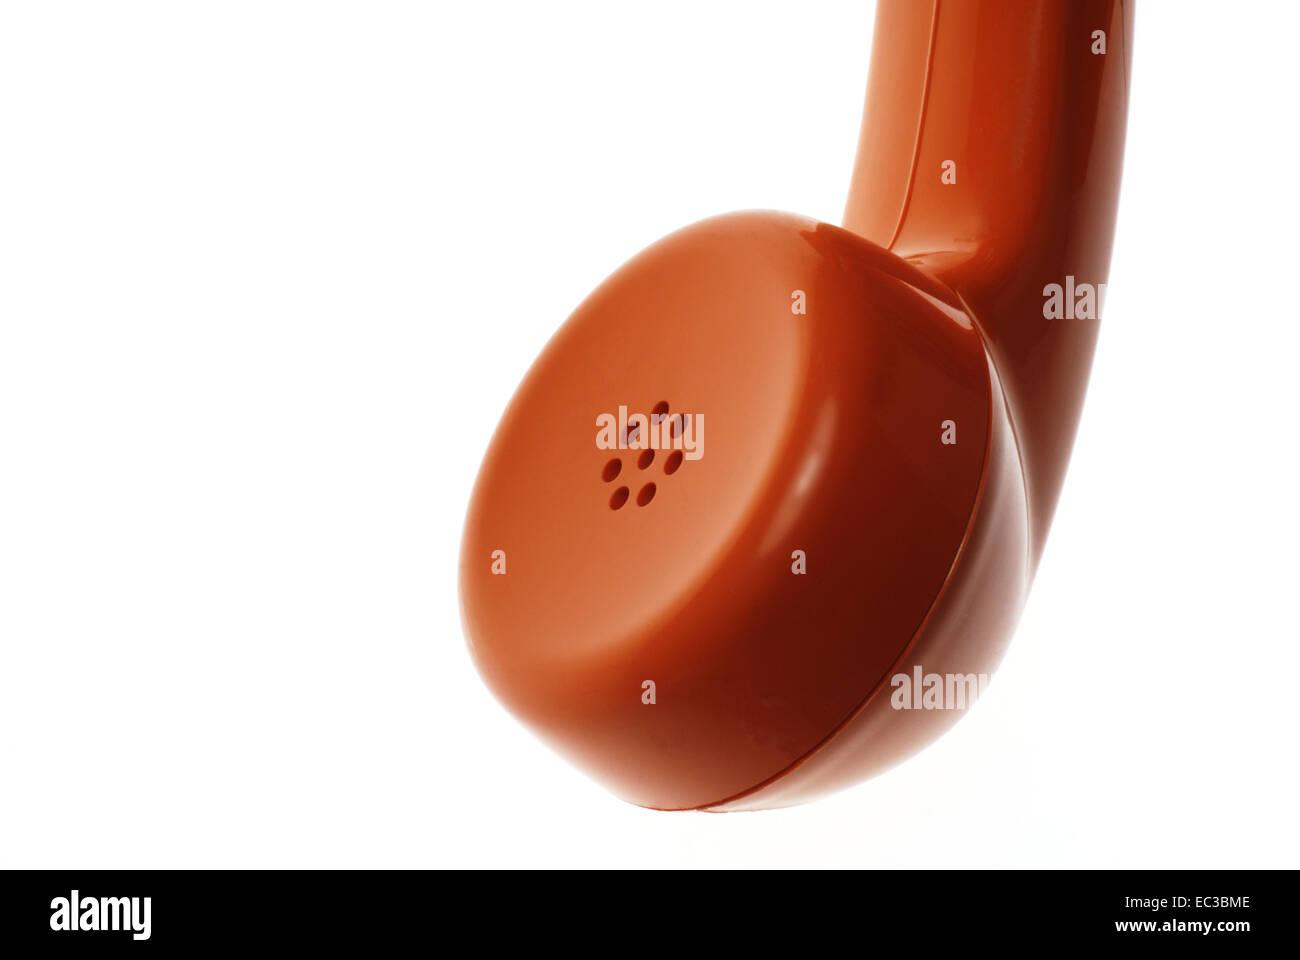 Isolated Old Orange Telephone Receiver - Stock Image